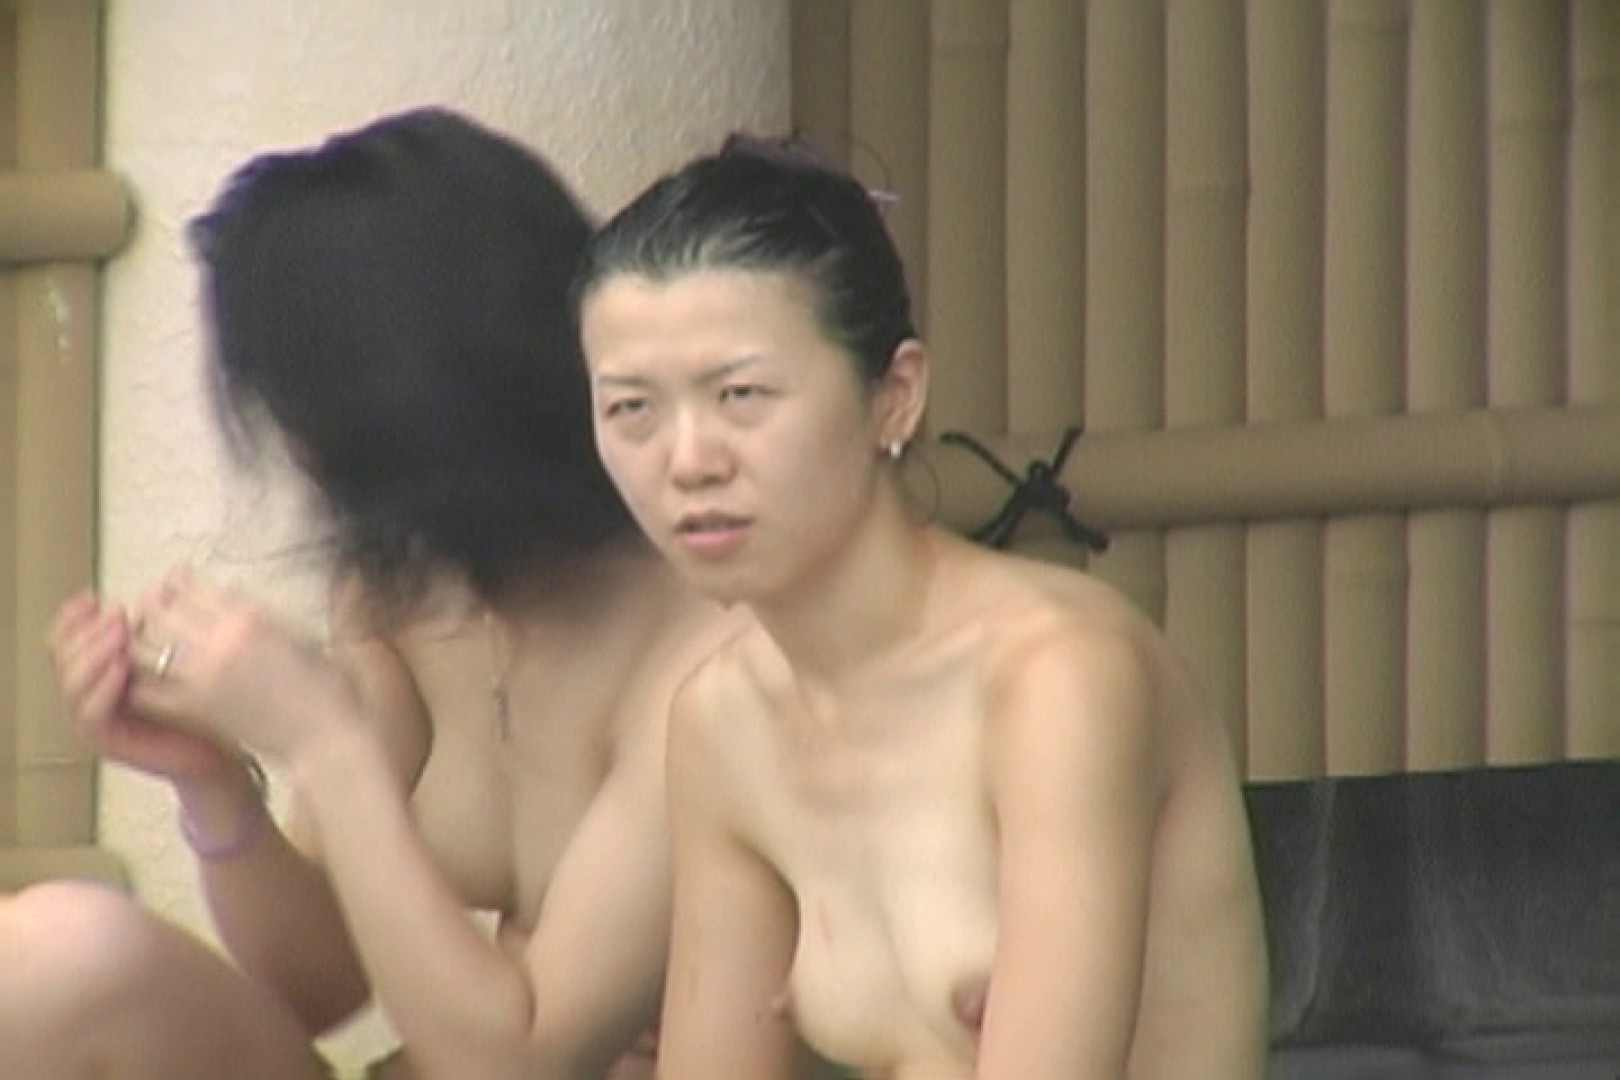 Aquaな露天風呂Vol.638 露天風呂編  87PIX 50